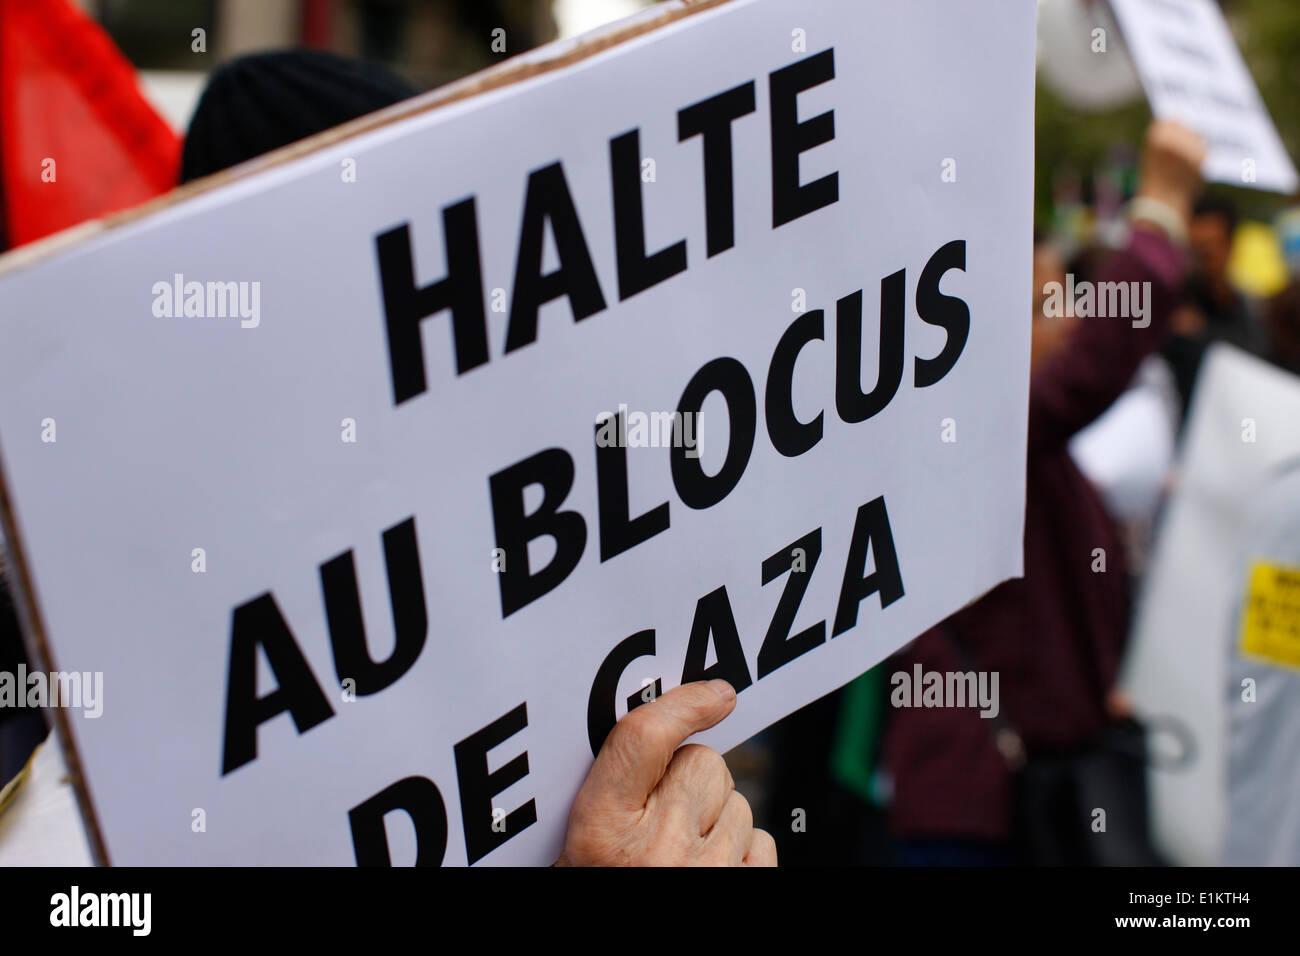 Demonstrator against the Gaza blocade - Stock Image